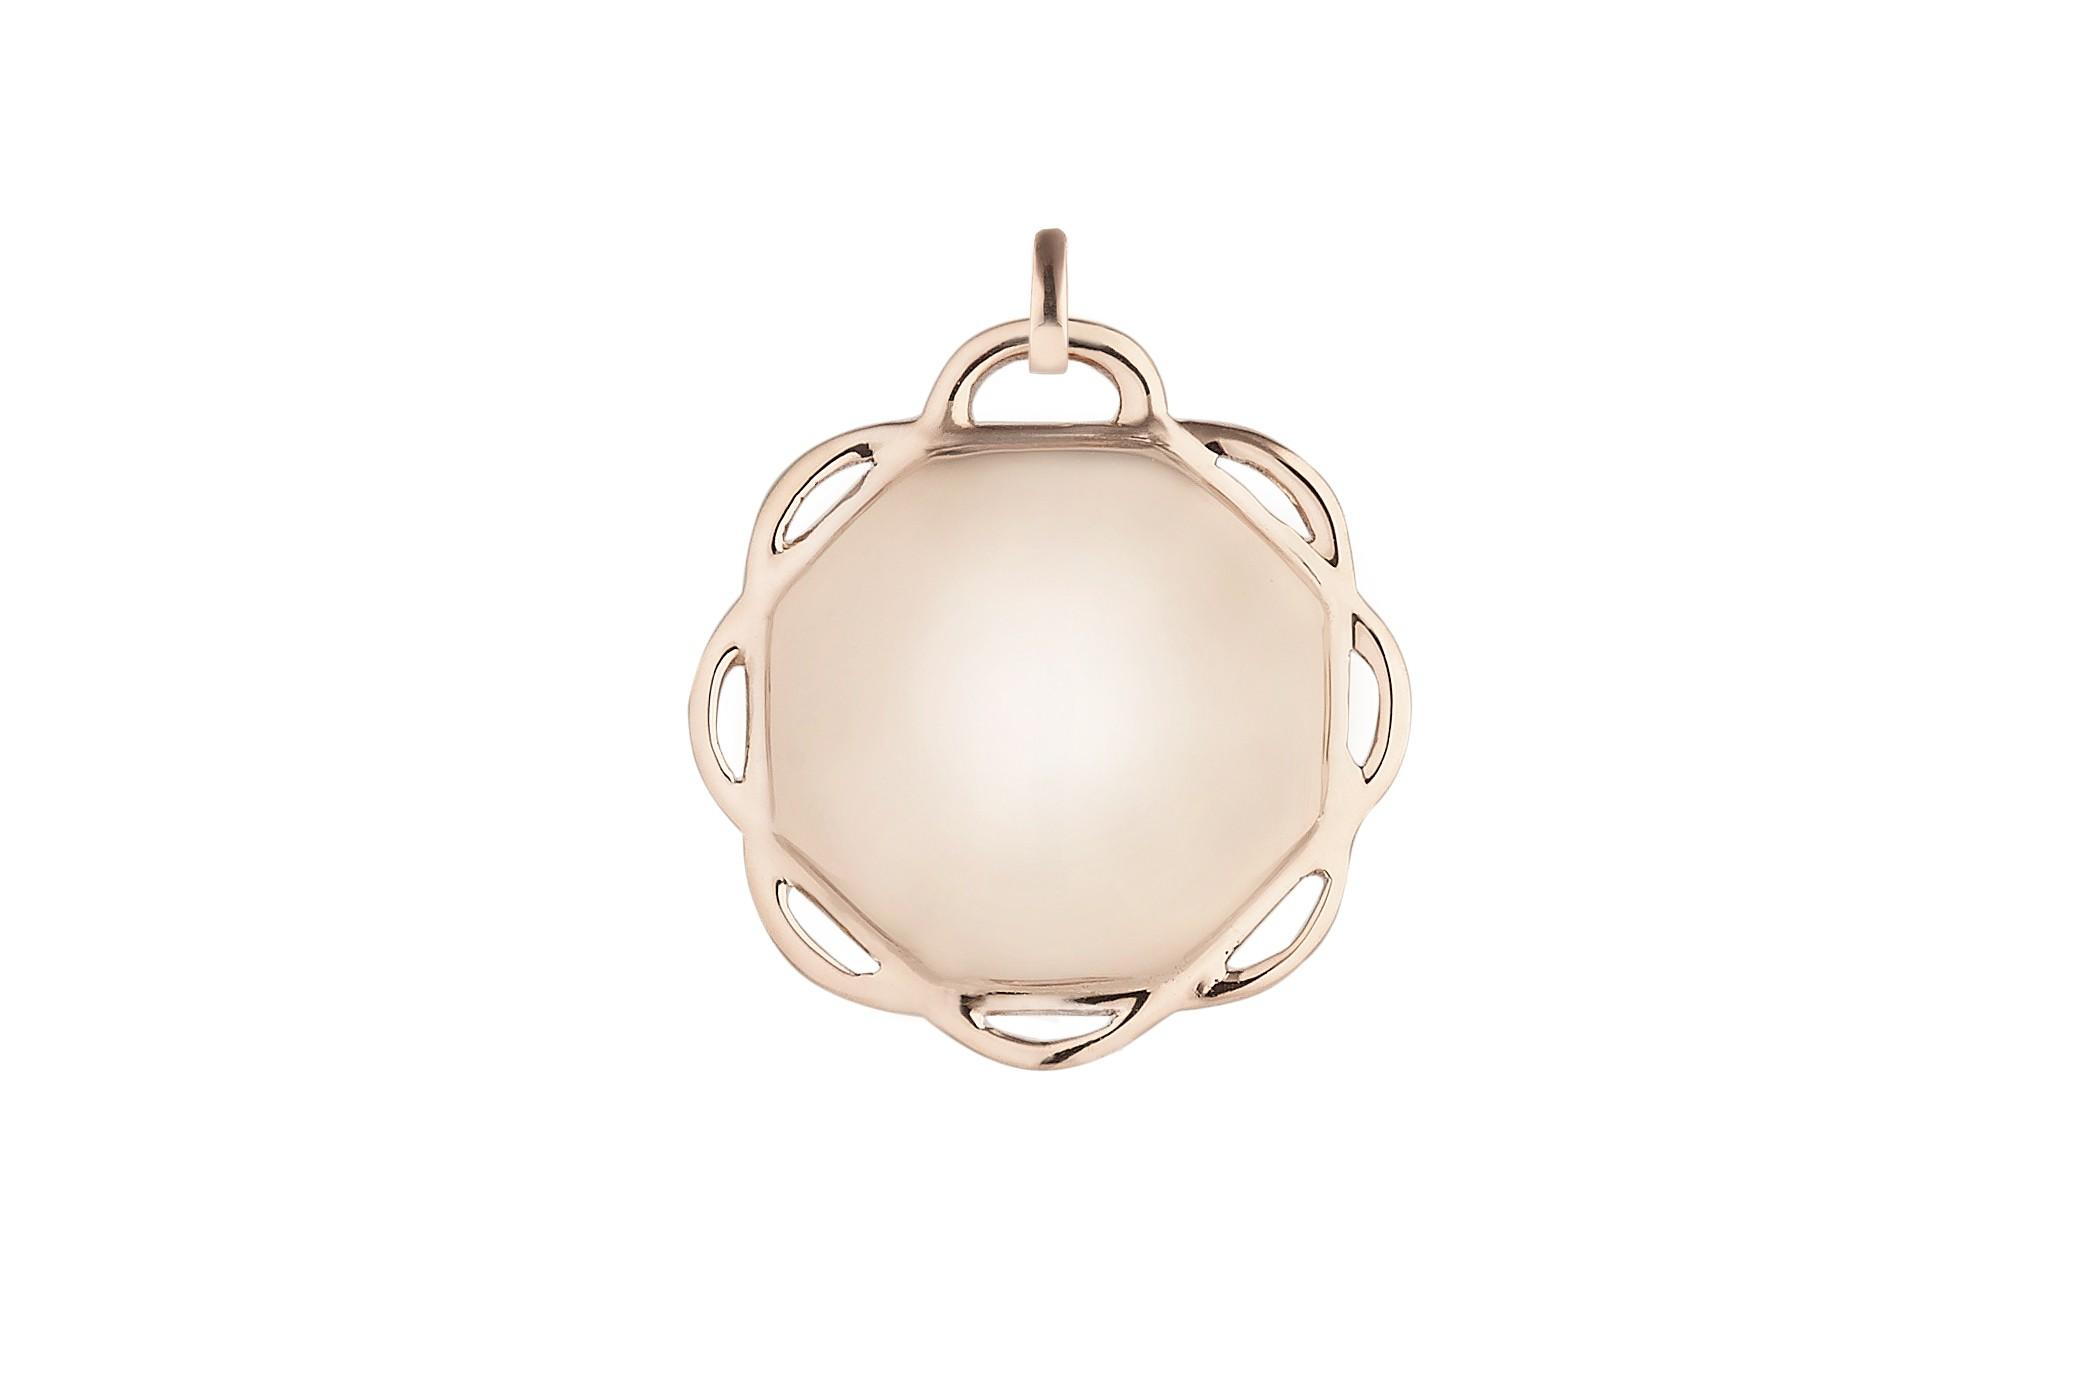 18K Rose Gold Single Circle Flora Charm w/Removable Bail